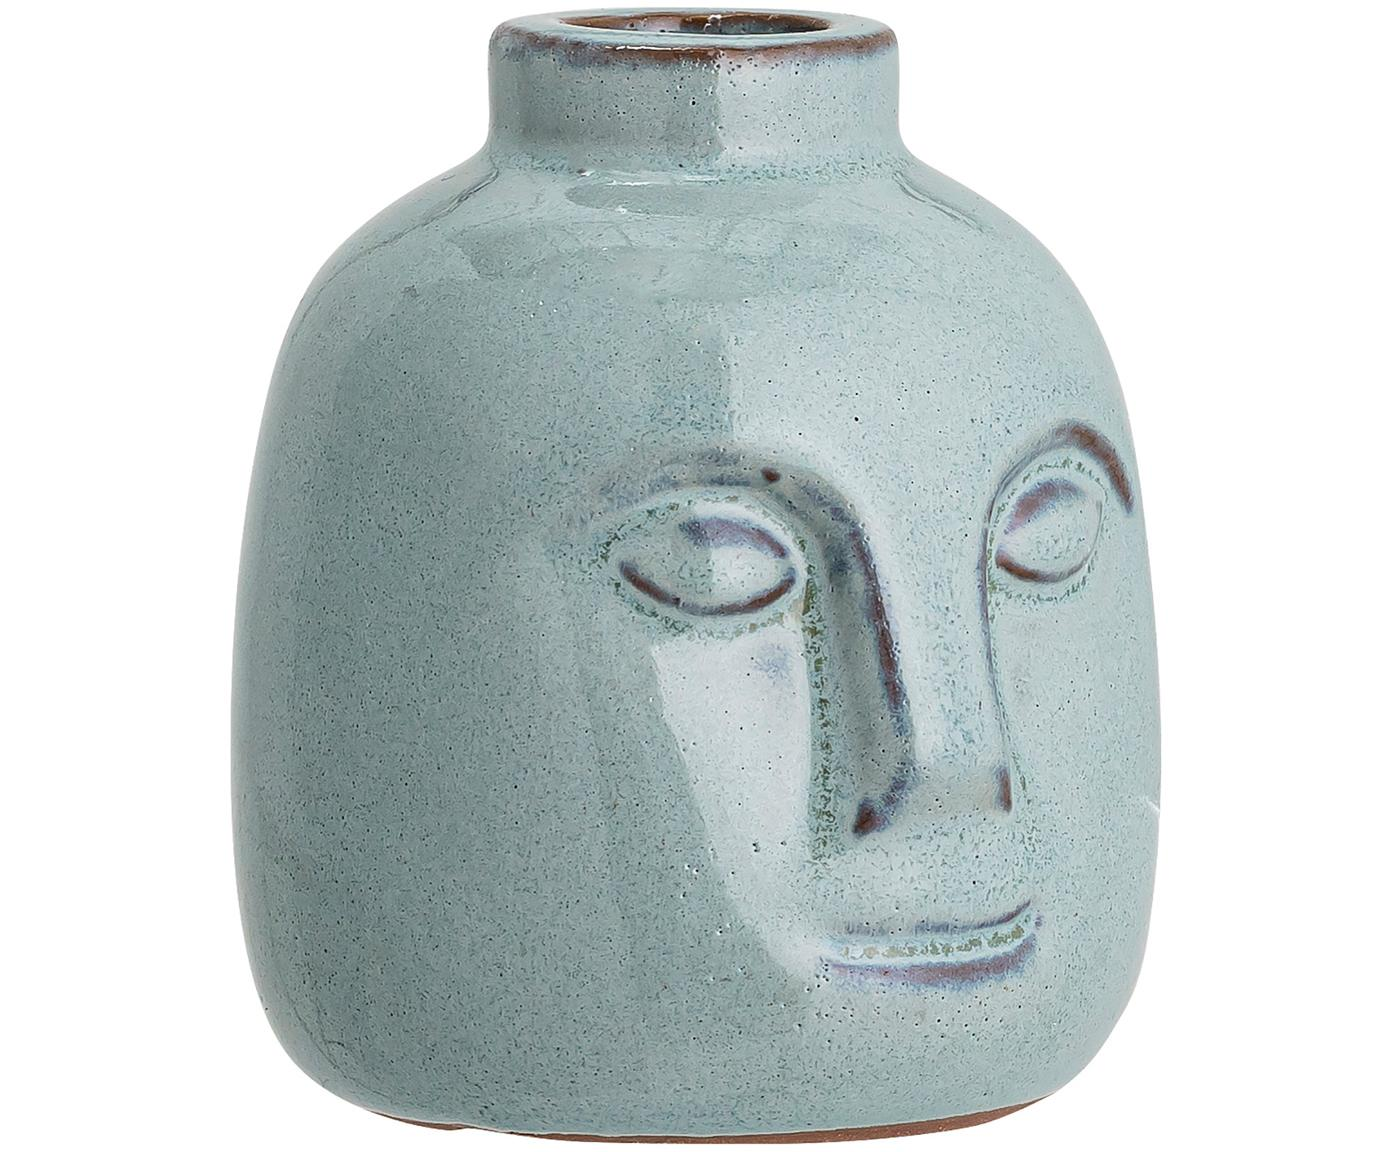 Handgemaakte kandelaar Brit, Keramiek, Blauw, Ø 9 cm